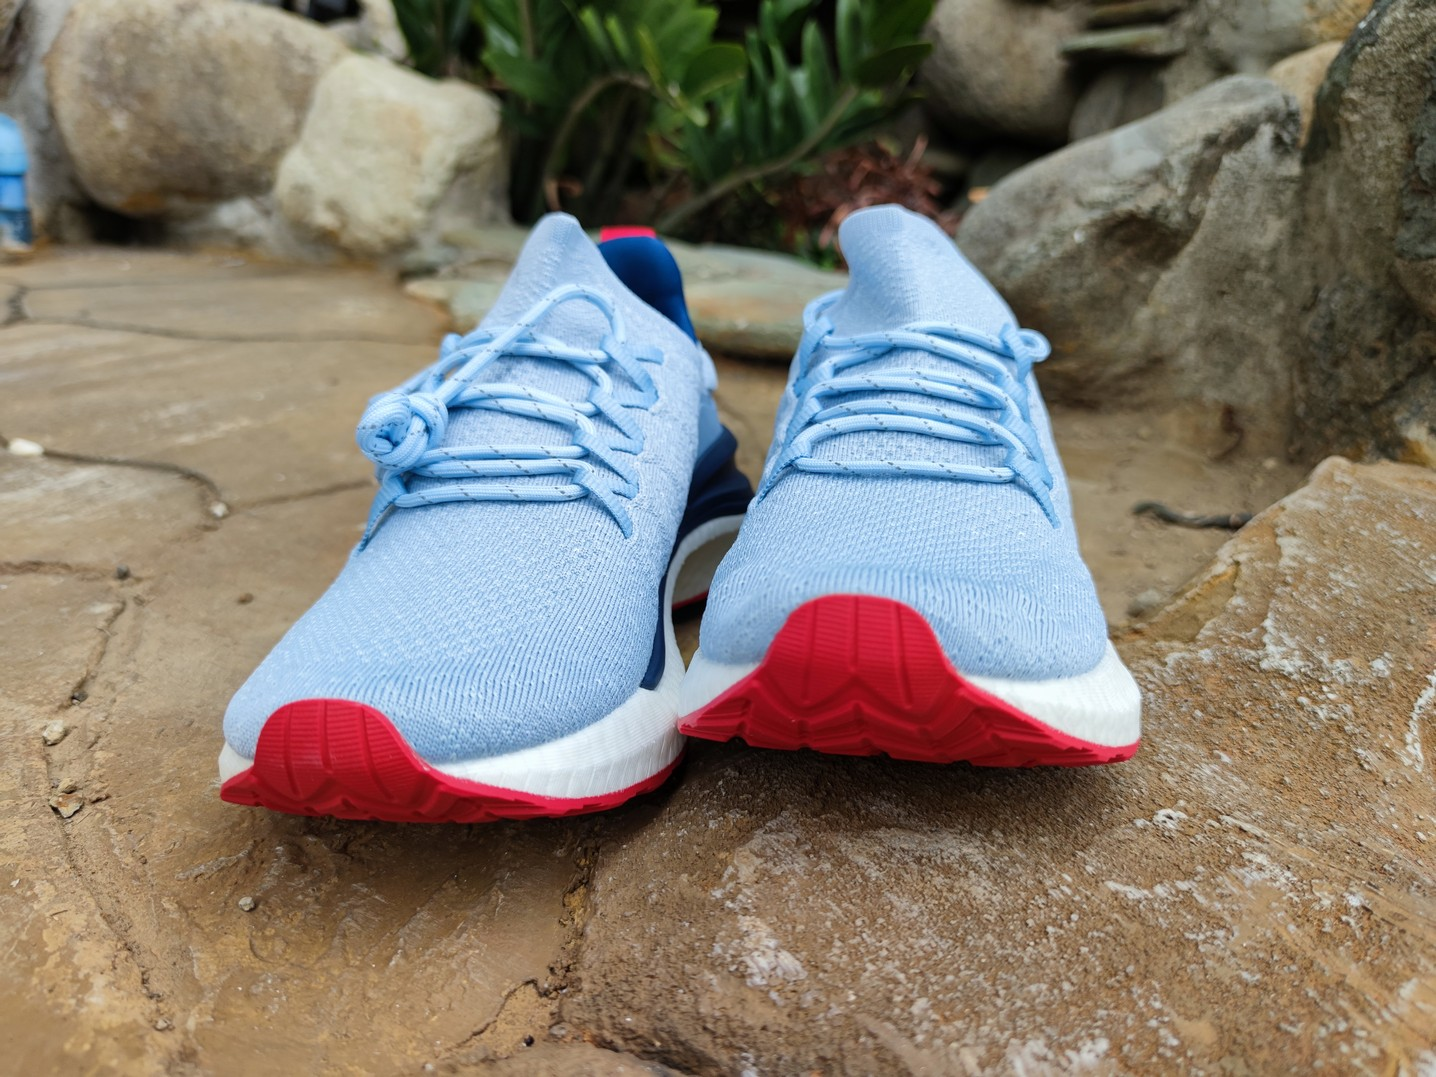 Xiaomi Mijia Sports Shoes Version 4.0 Unboxing